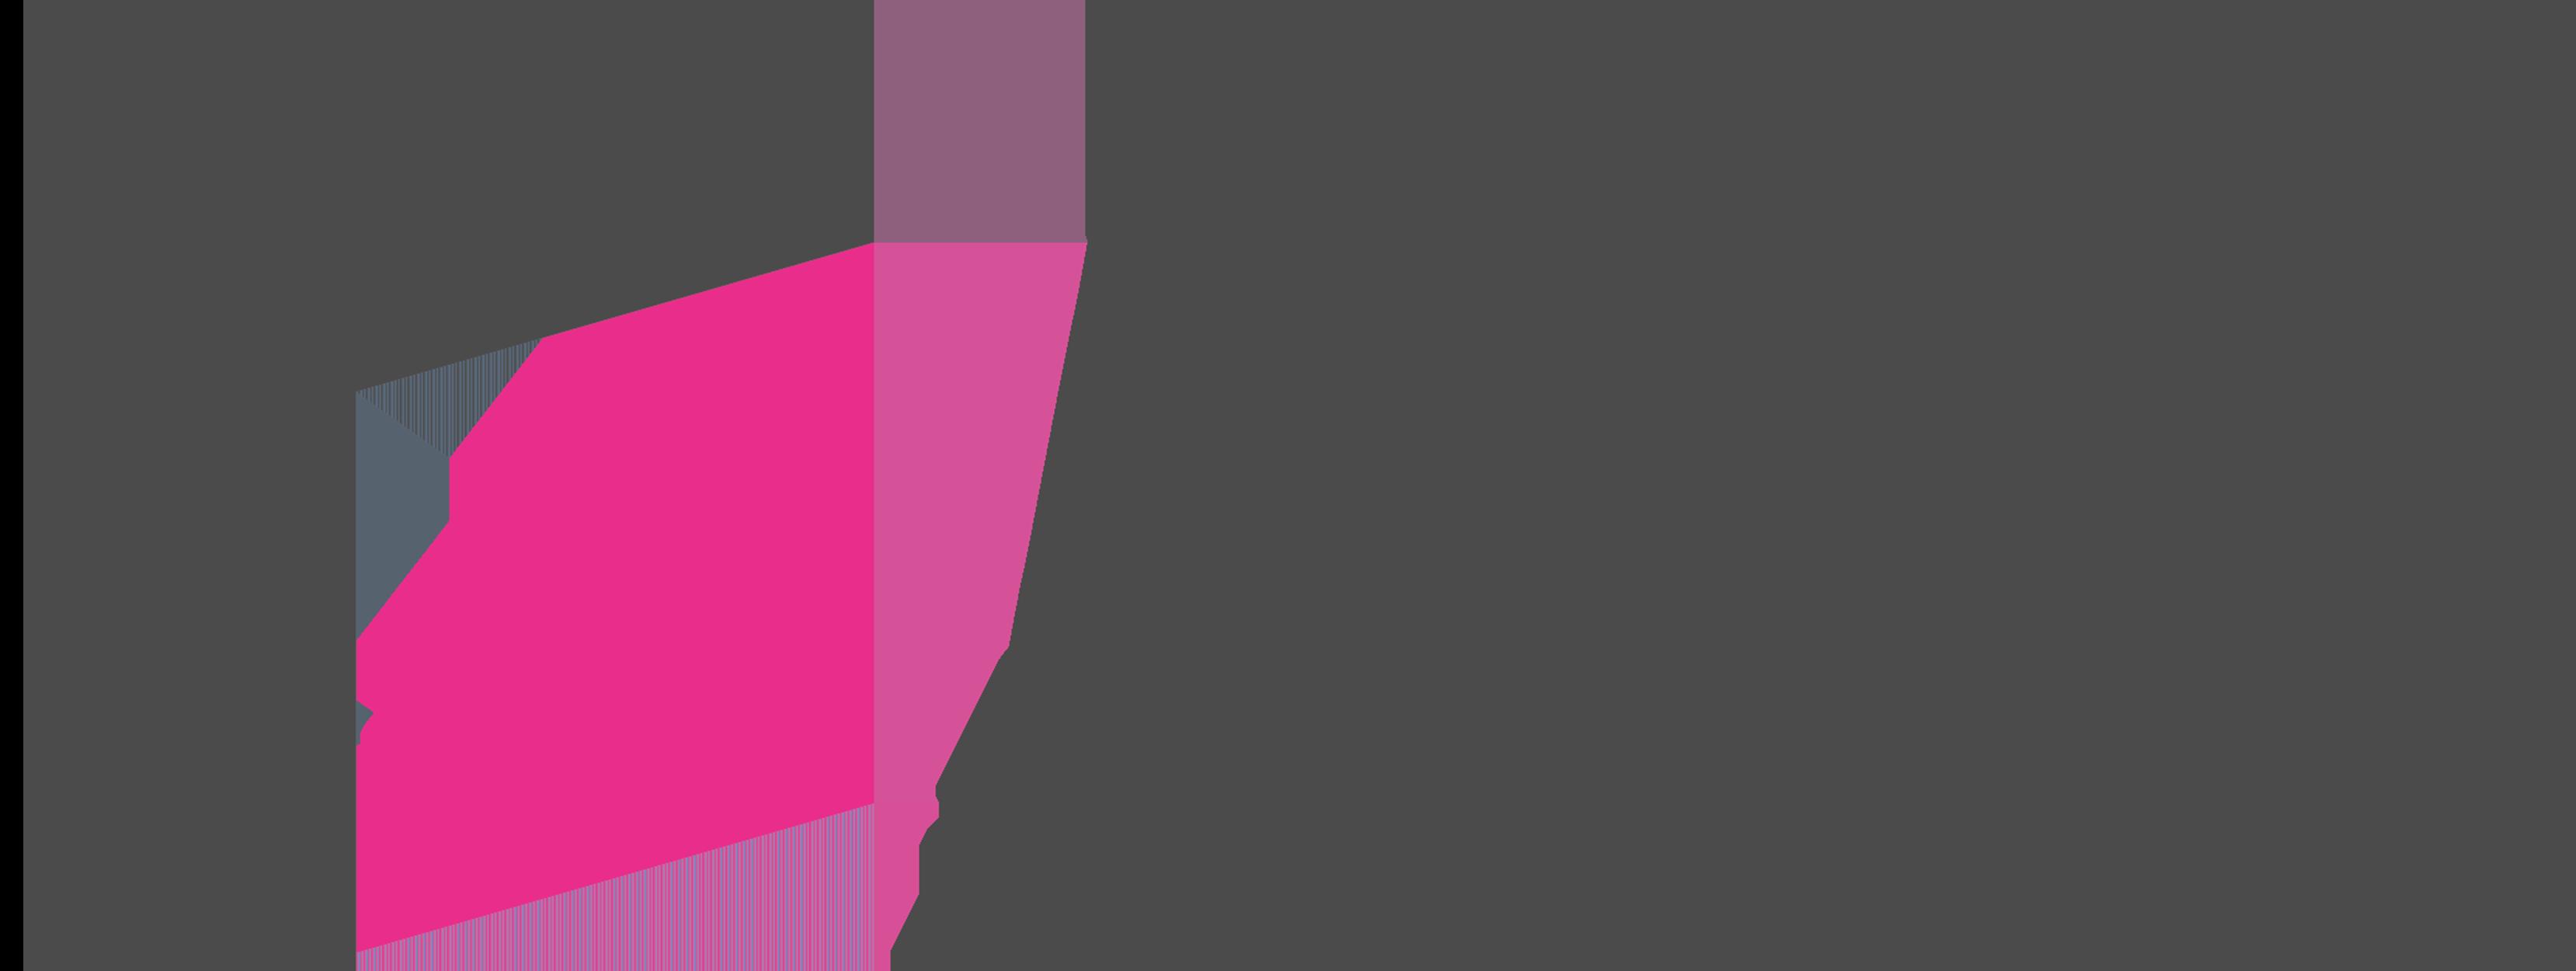 MARCHIO-AIR-Translations_retina_003